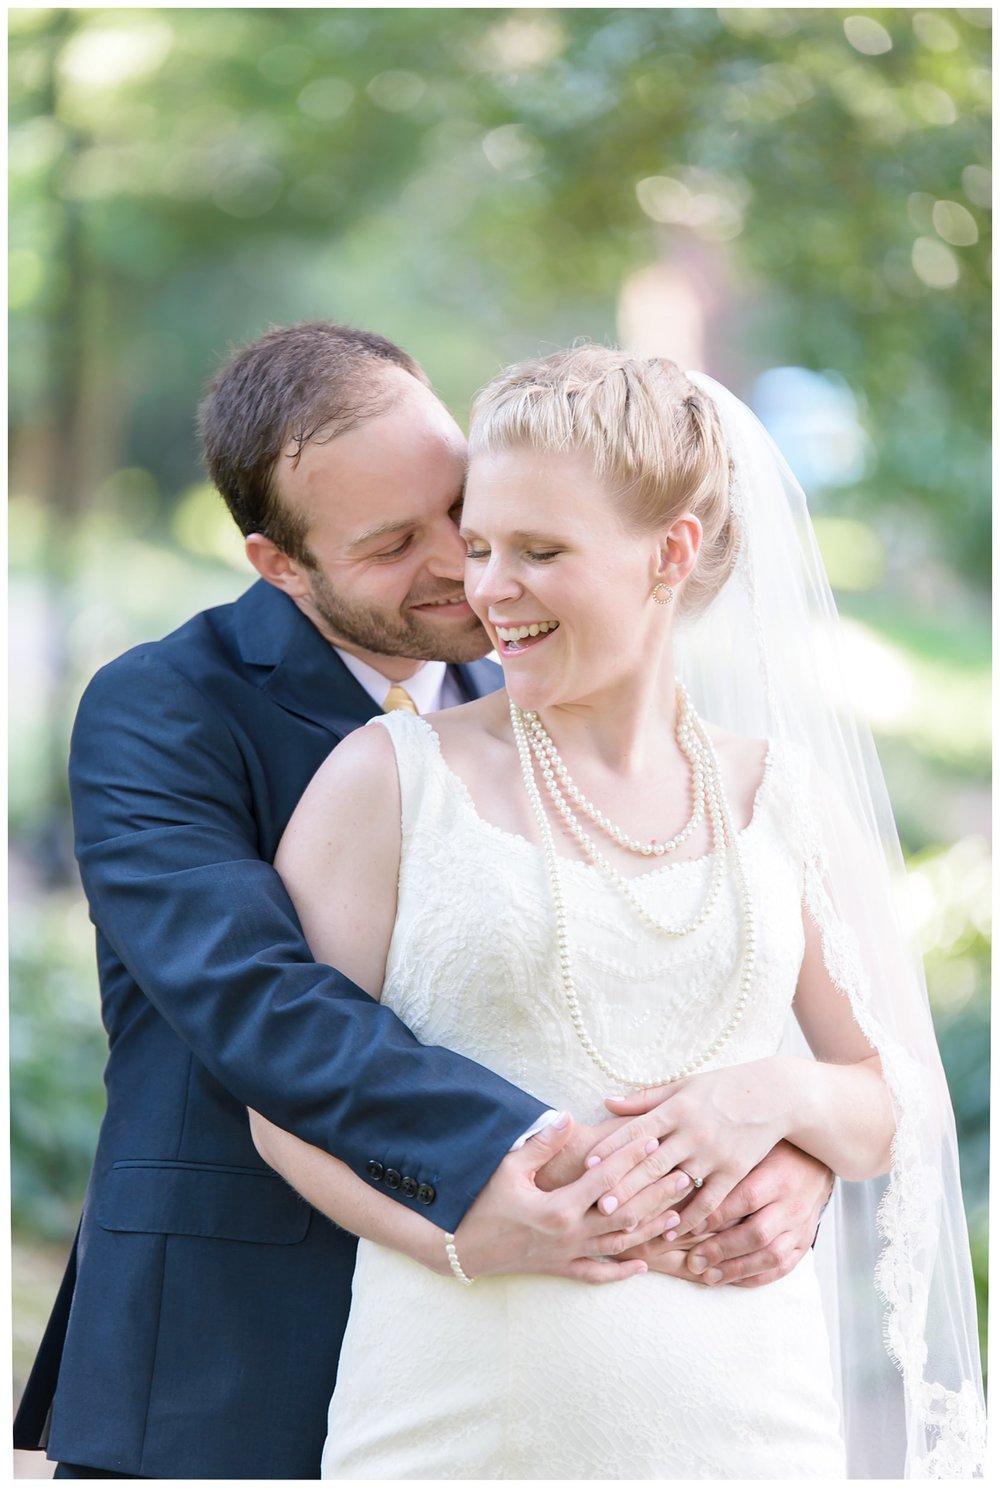 Della and Andrew Wedding Photos_Hendry House Arlington Virginia_Stephanie Kopf Photography_Northern Virginia Wedding Photography-89.jpg